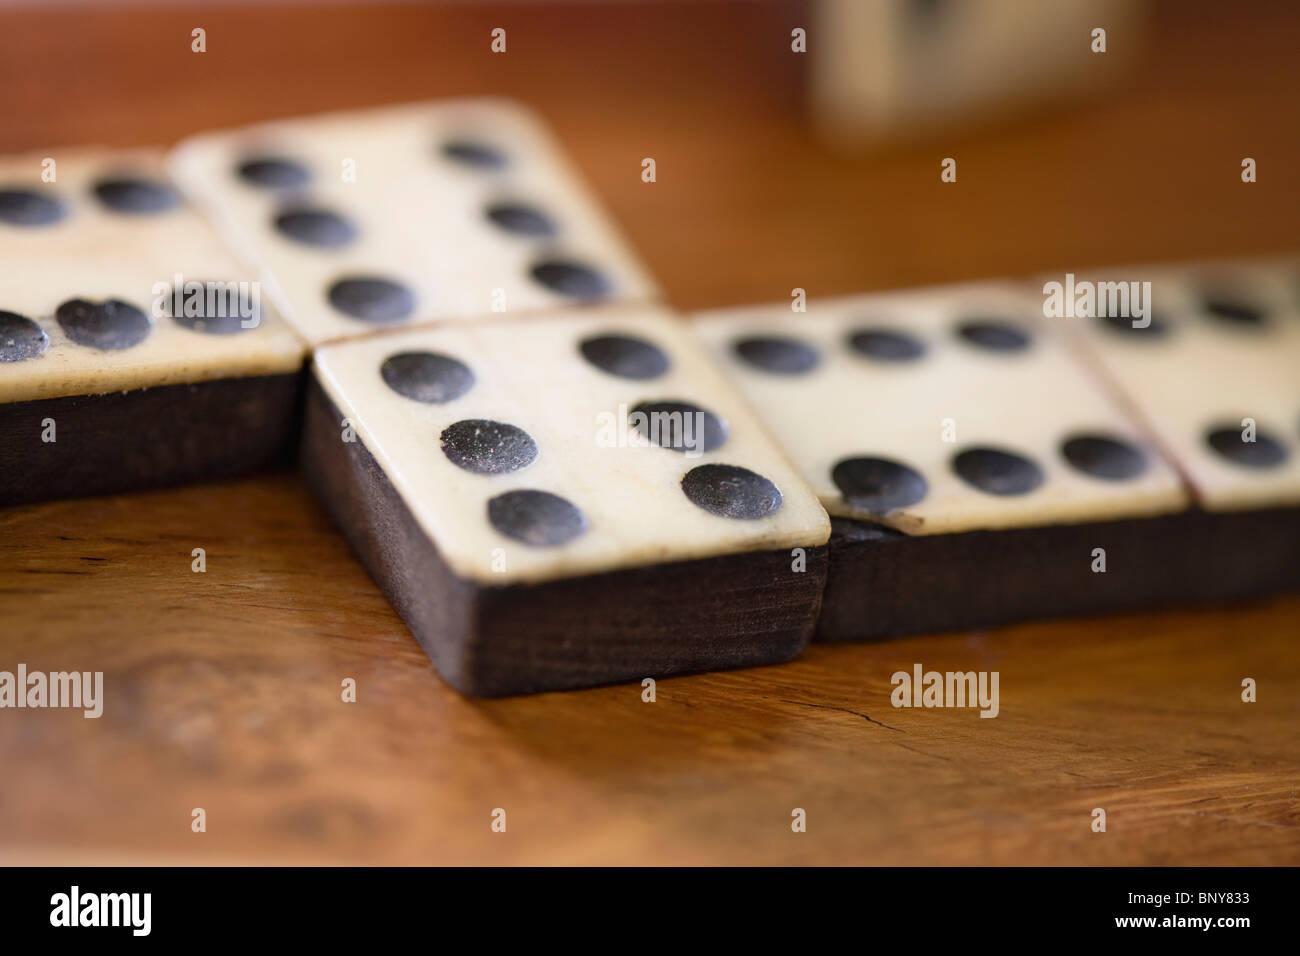 Domino - Stock Image